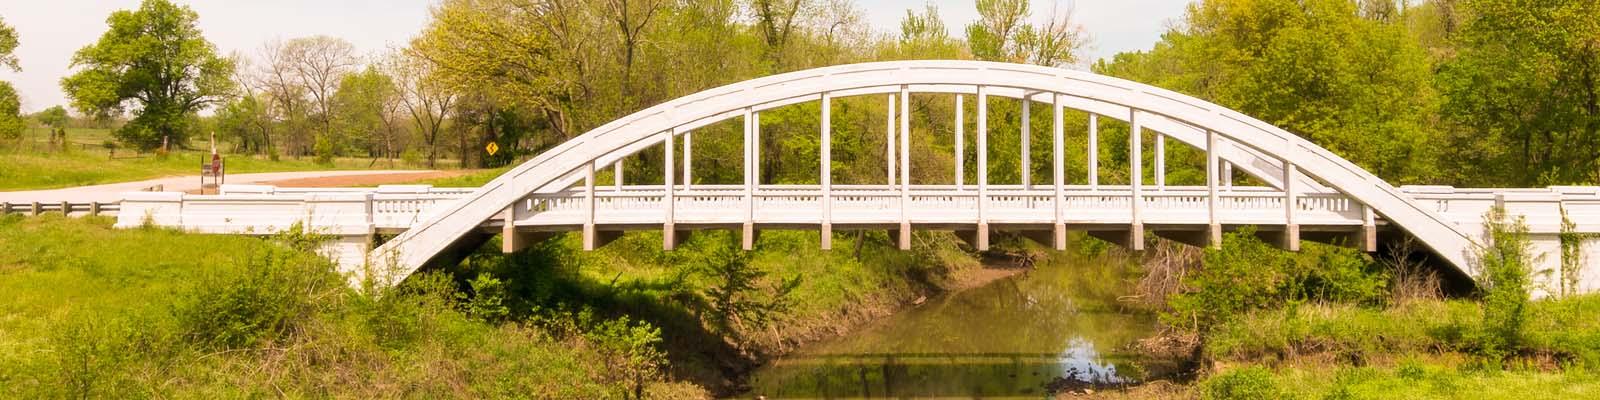 Pictured: A bridge in Oklahoma.